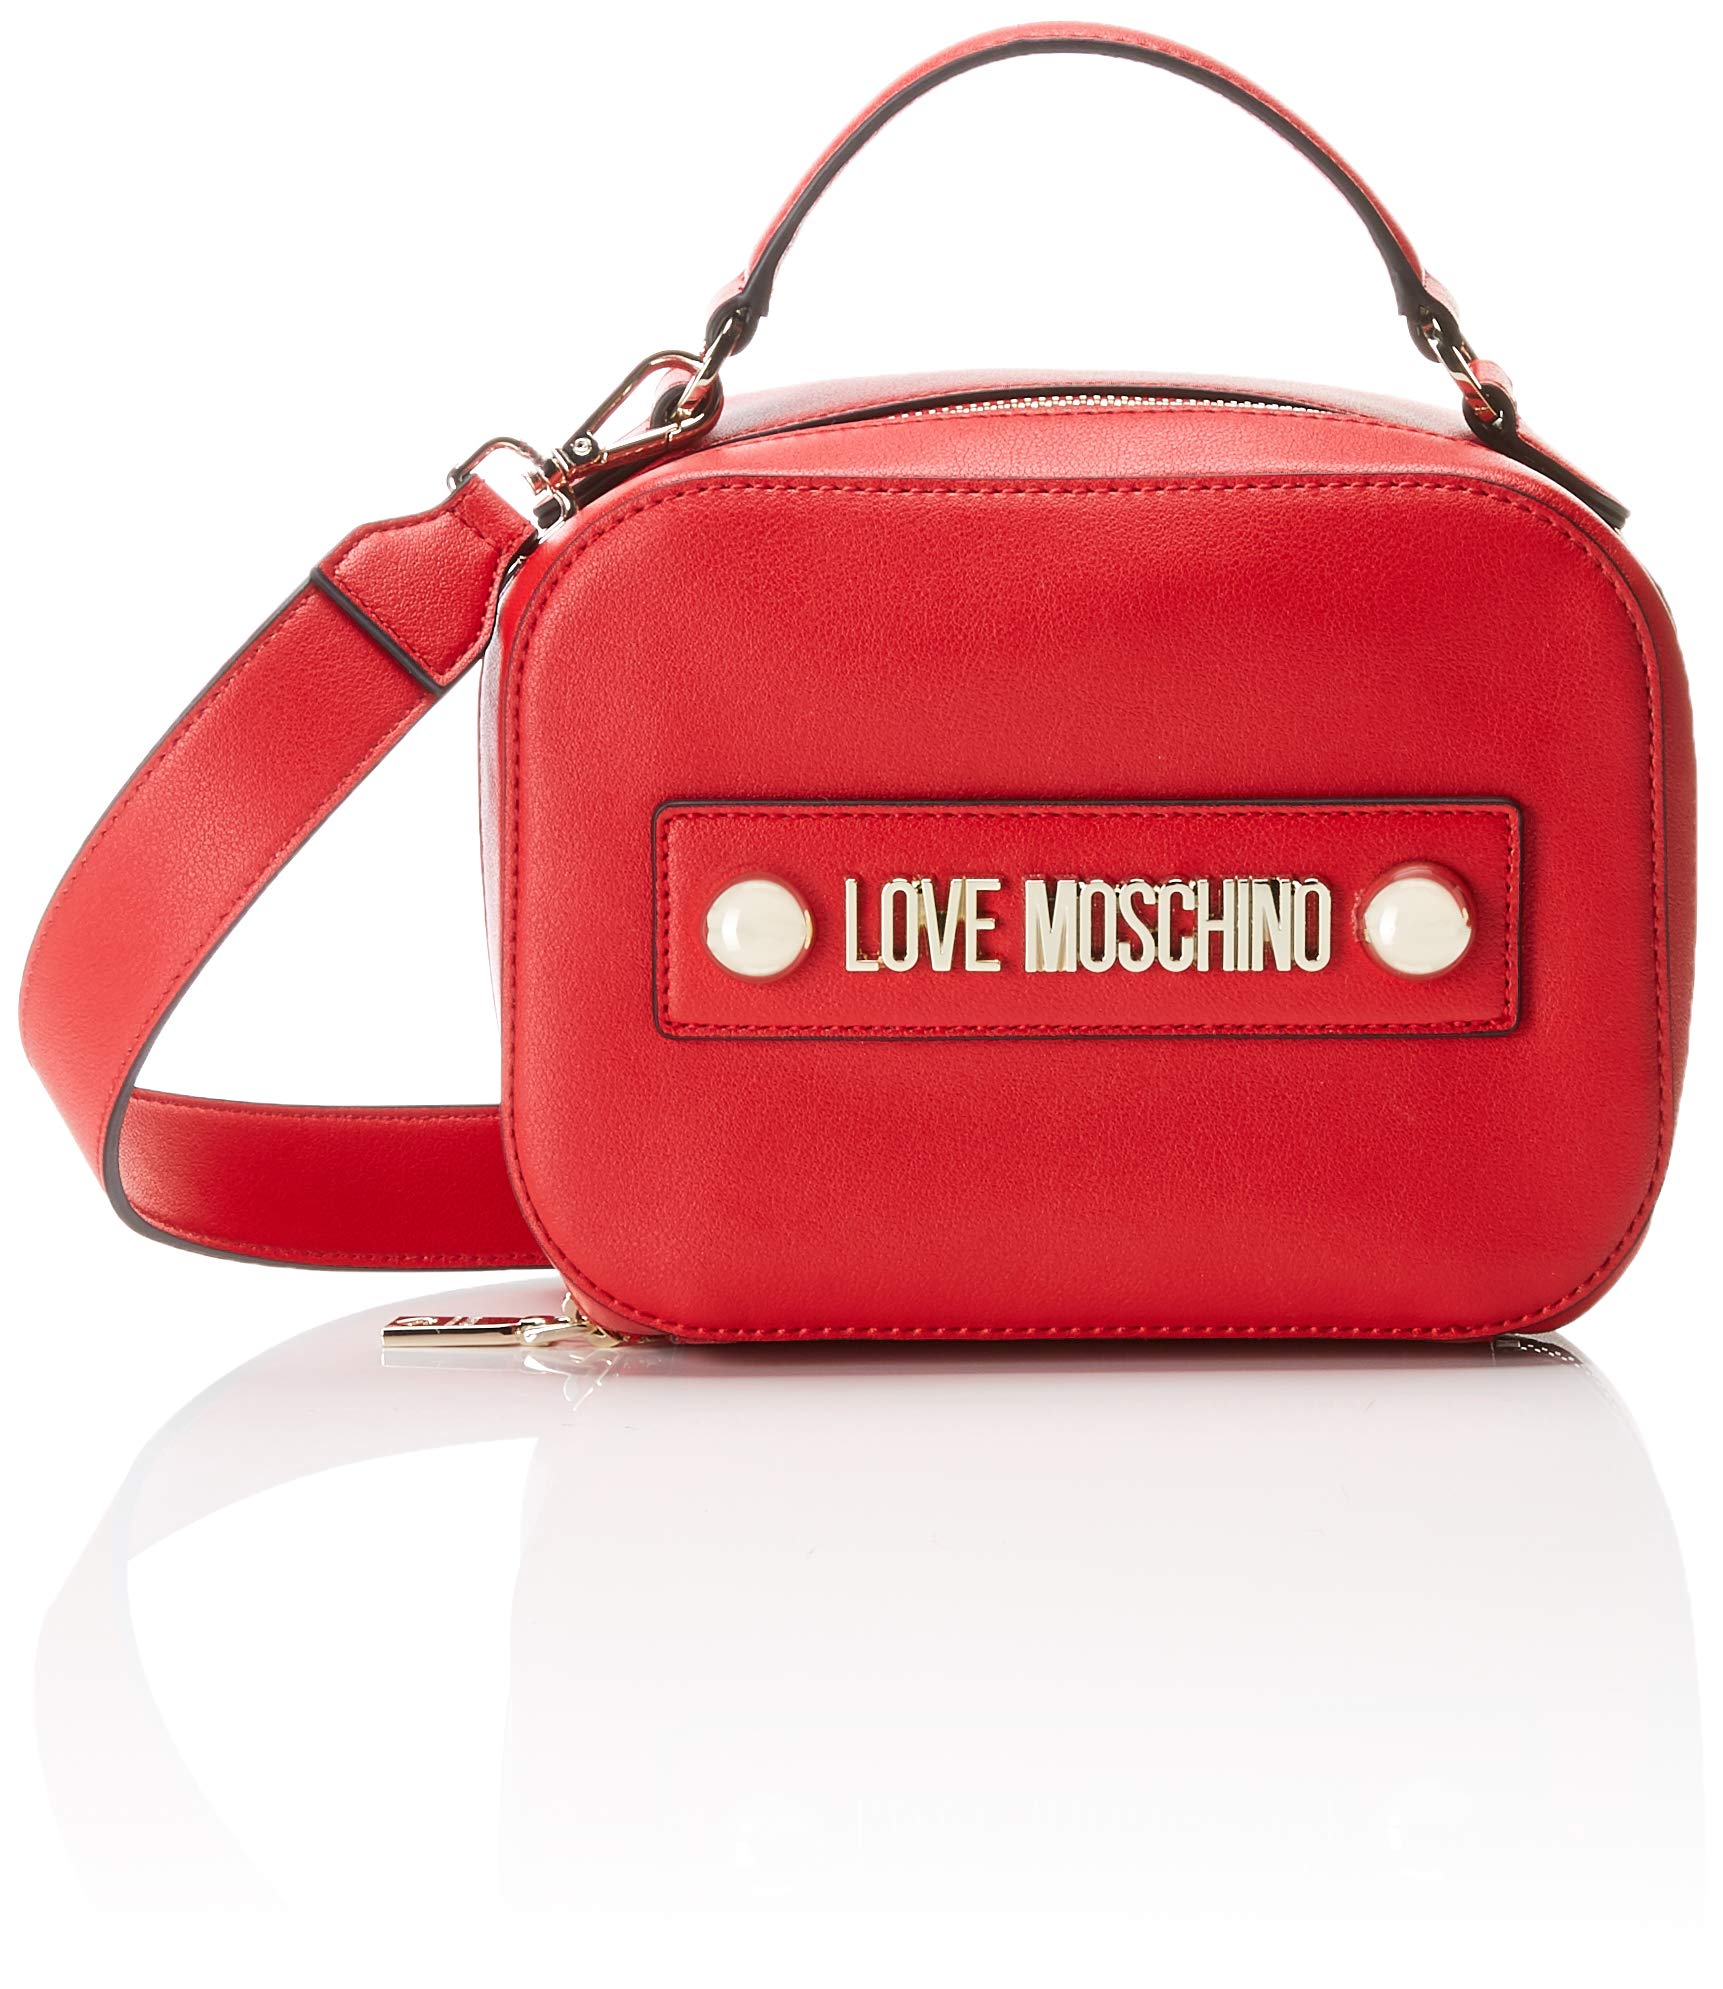 PuSac Love L Cmw FemmeRougerosso10x15x20 X Soft Porté Borsa H Main Grain Moschino l1F3cTJK